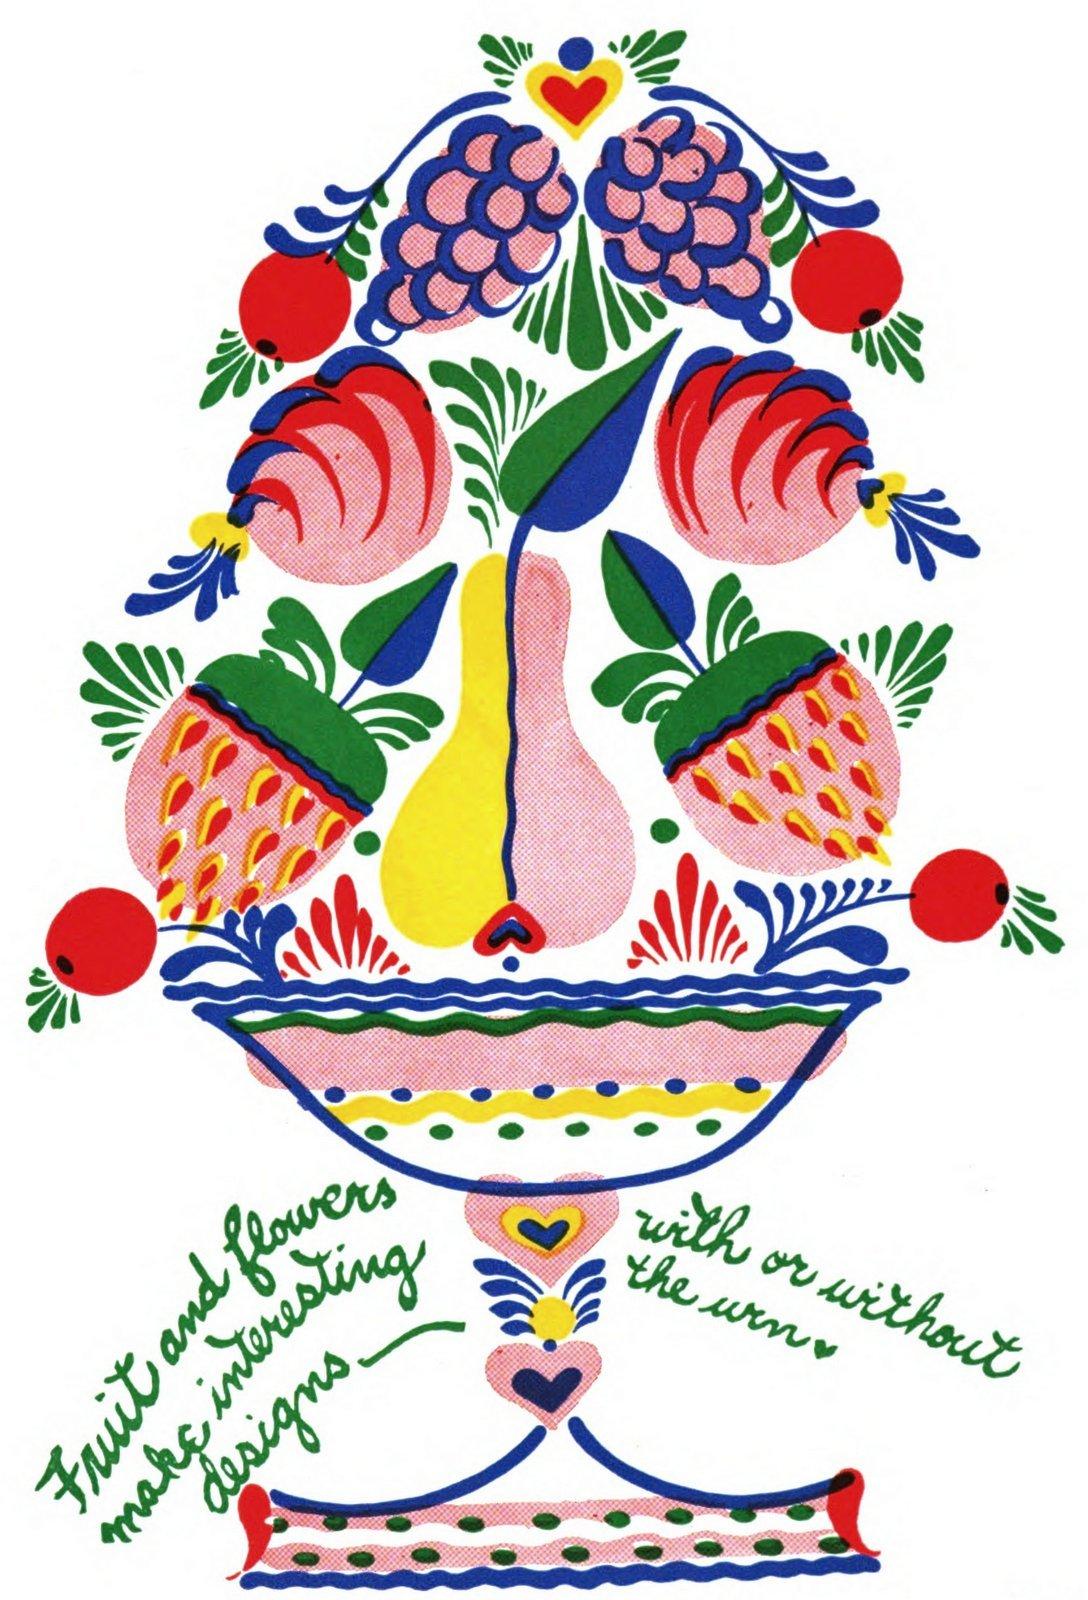 Vintage folk art paint designs by Peter Hunt (1)